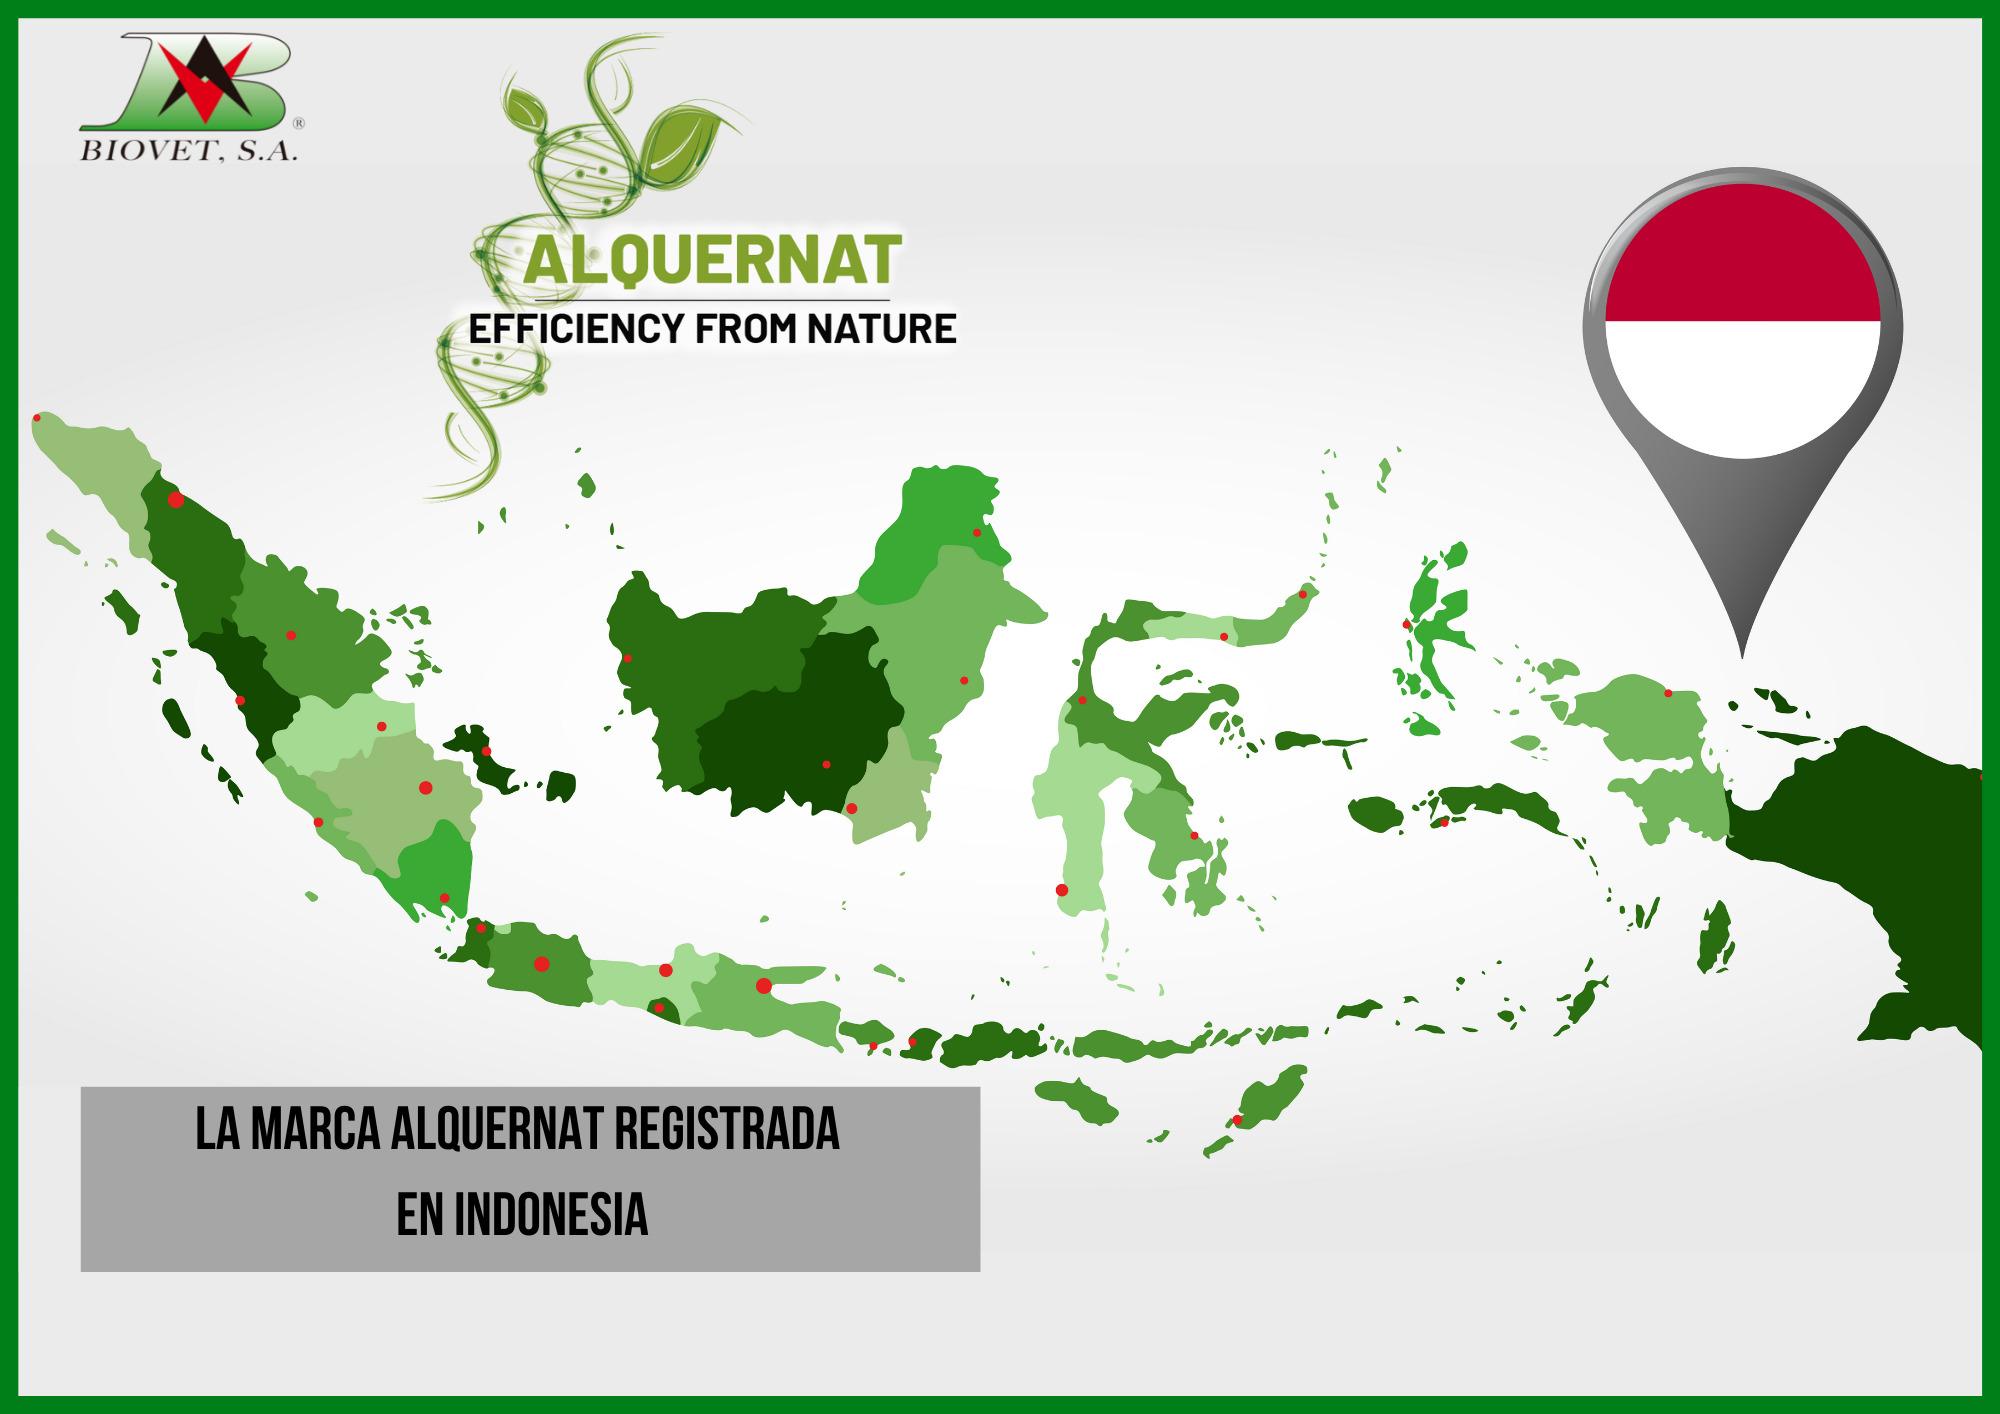 Alquernat en Indonesia